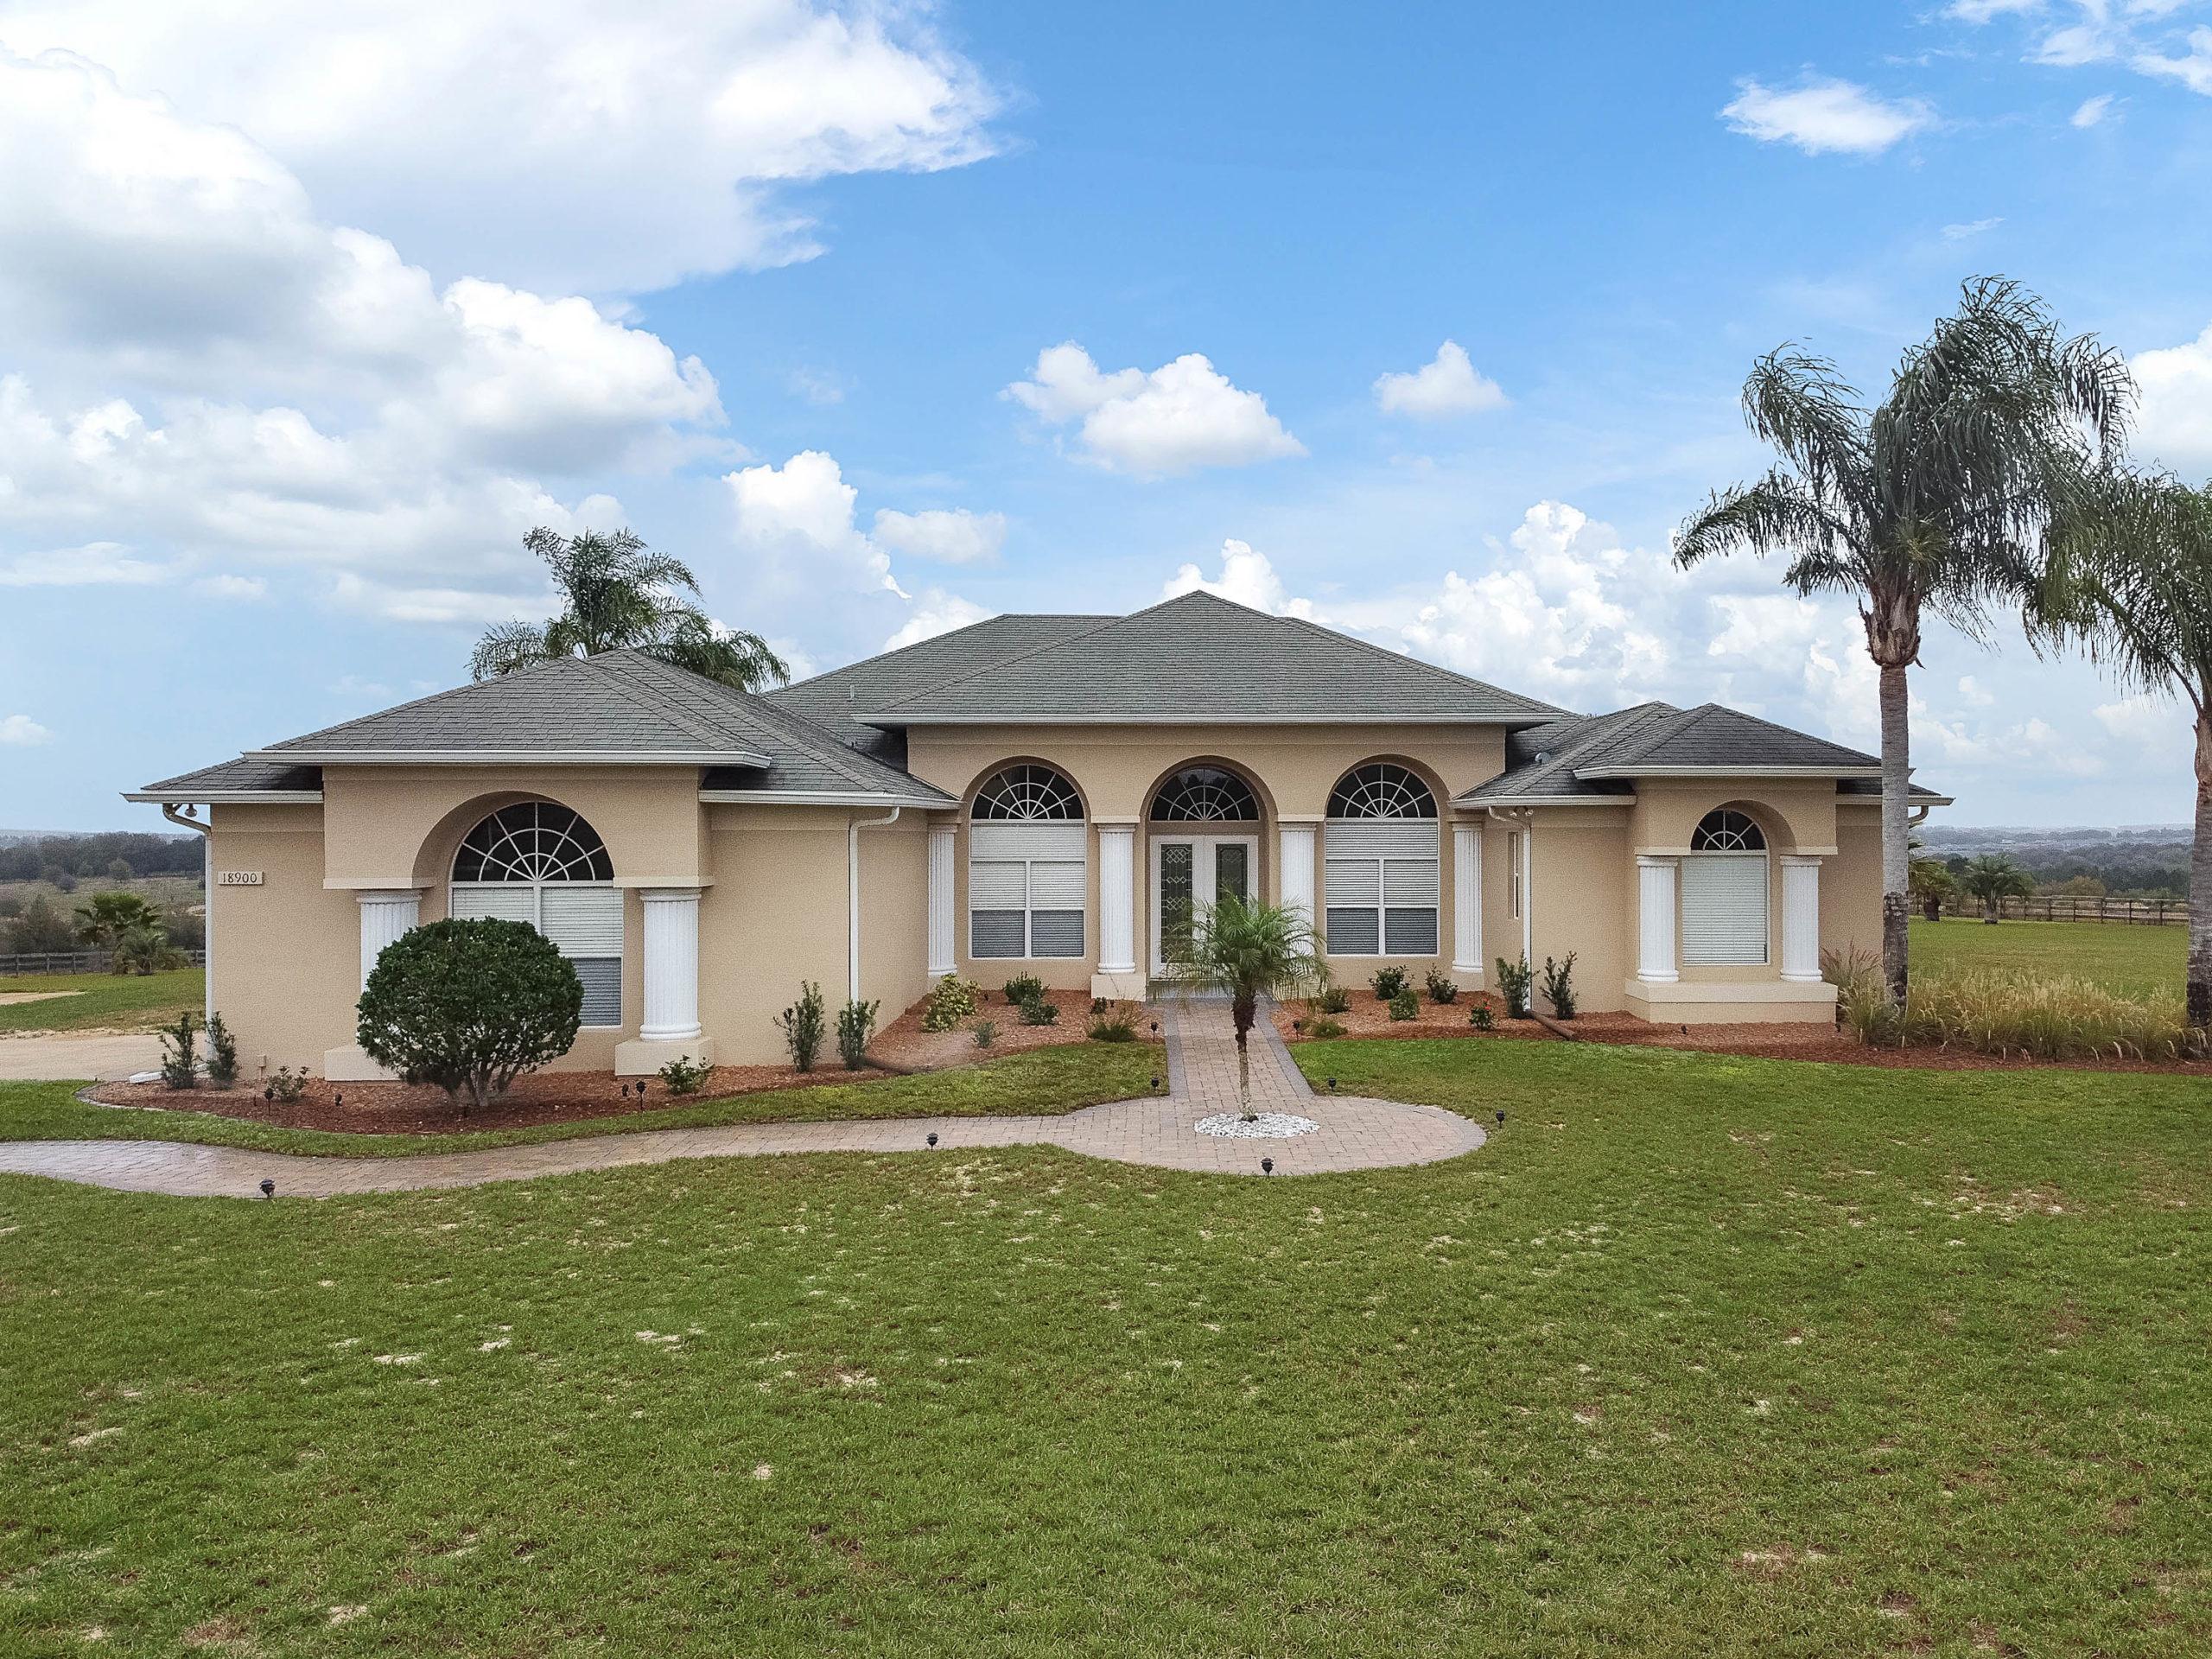 18900 Southwest Libby Road, Groveland, FL 34736